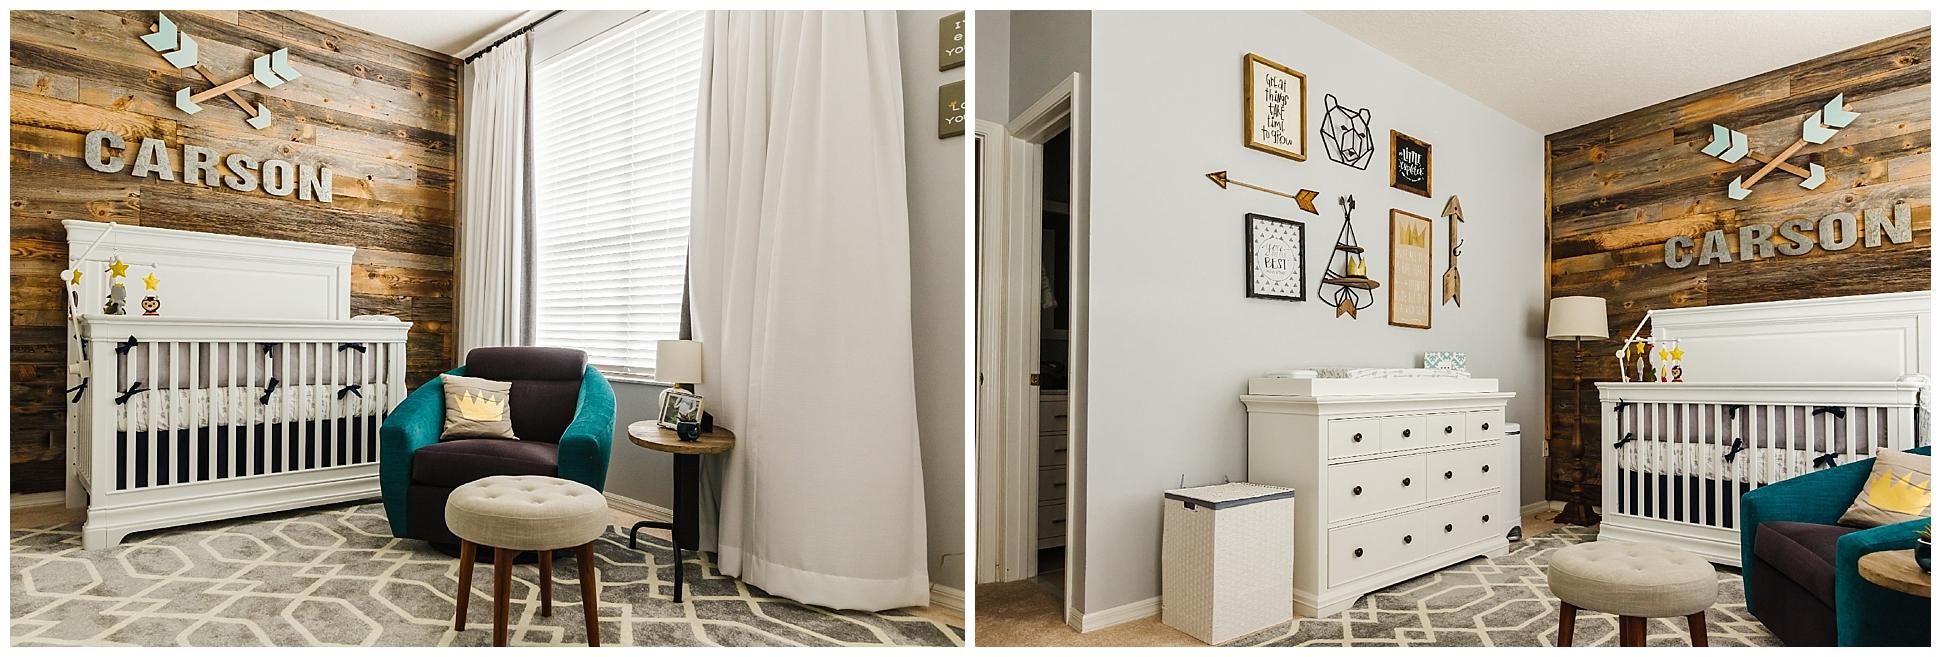 ann-cox-interior-design-nursery-where-the-wild-things-are_2.jpg